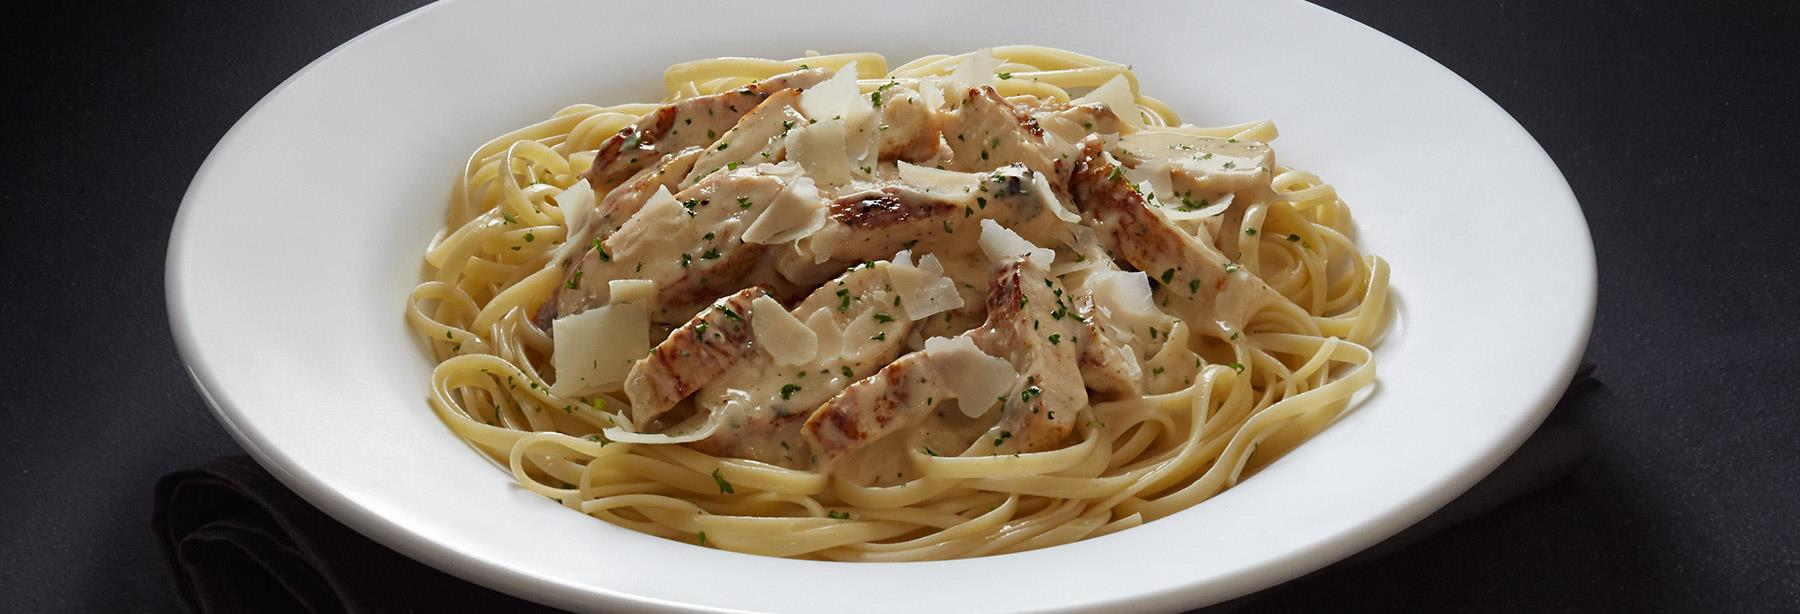 Cajun Chicken Linguini Alfredo | Red Lobster Seafood Restaurants